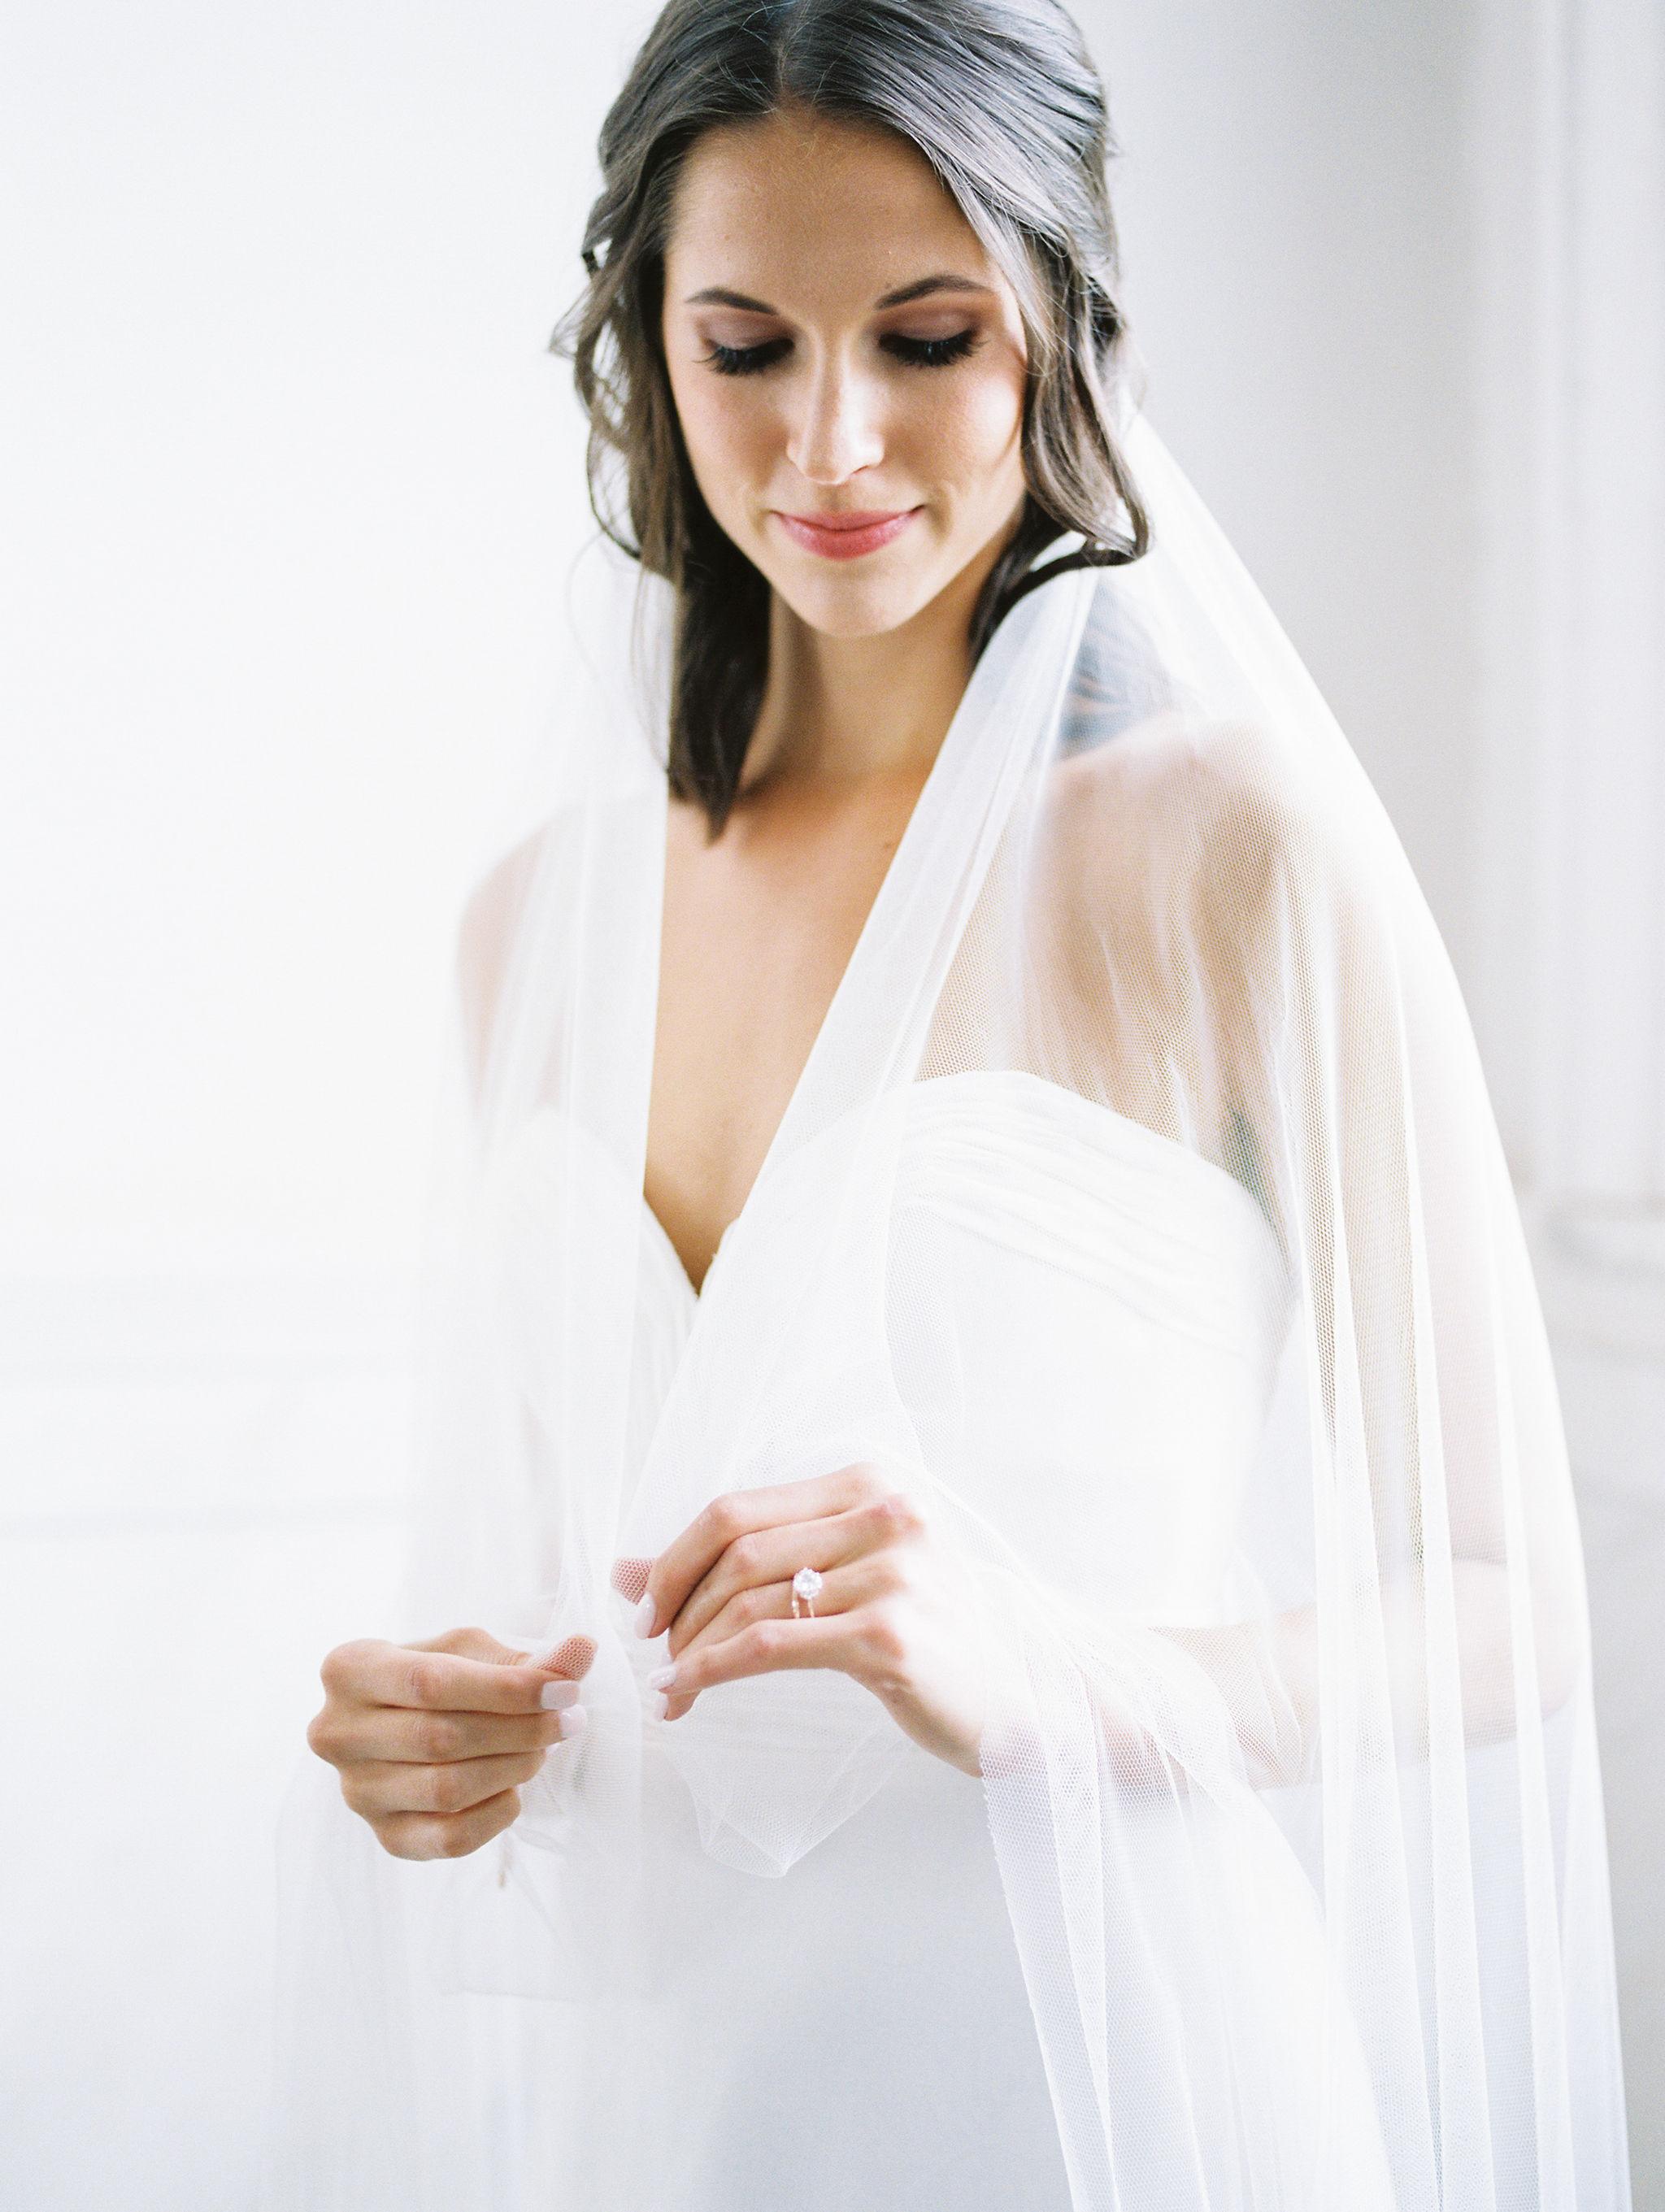 www.hannahforsberg.com-delkab-court-house-wedding-decatur-atlanta-wedding-photographer-115.jpg